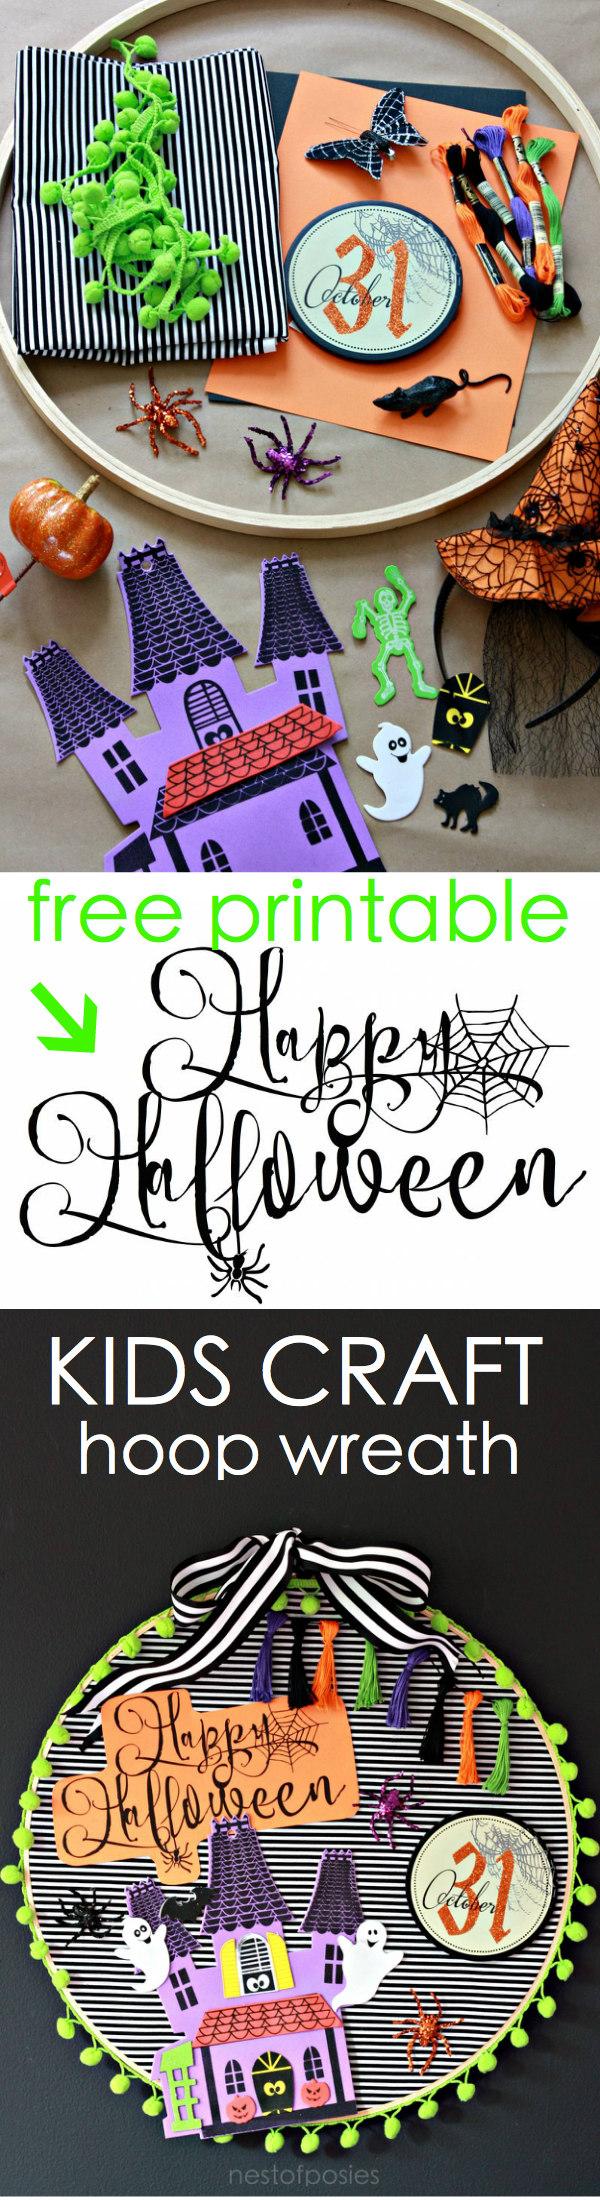 Kids Halloween Craft with free printable. Halloween Hoop Wreath